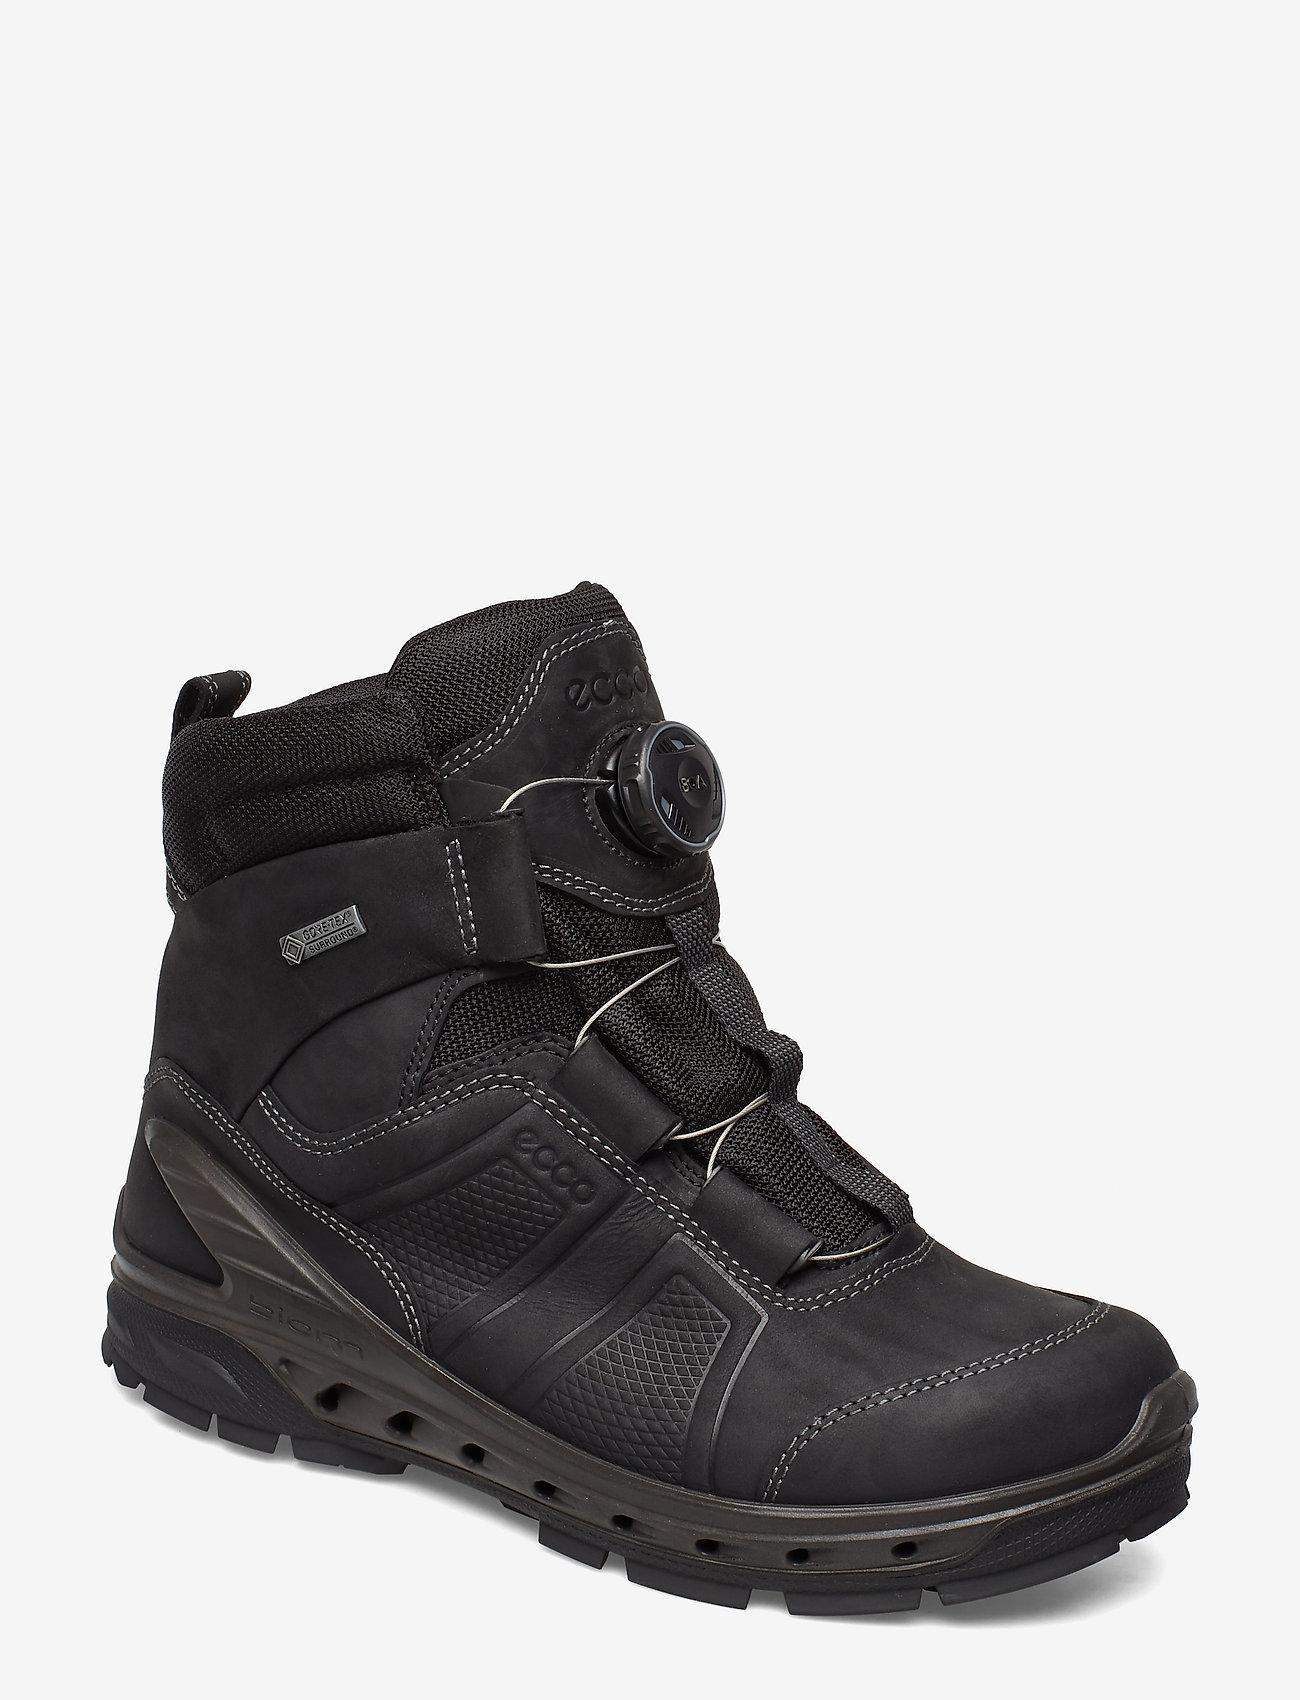 ECCO - BIOM VENTURE TR M - vinter boots - black/black